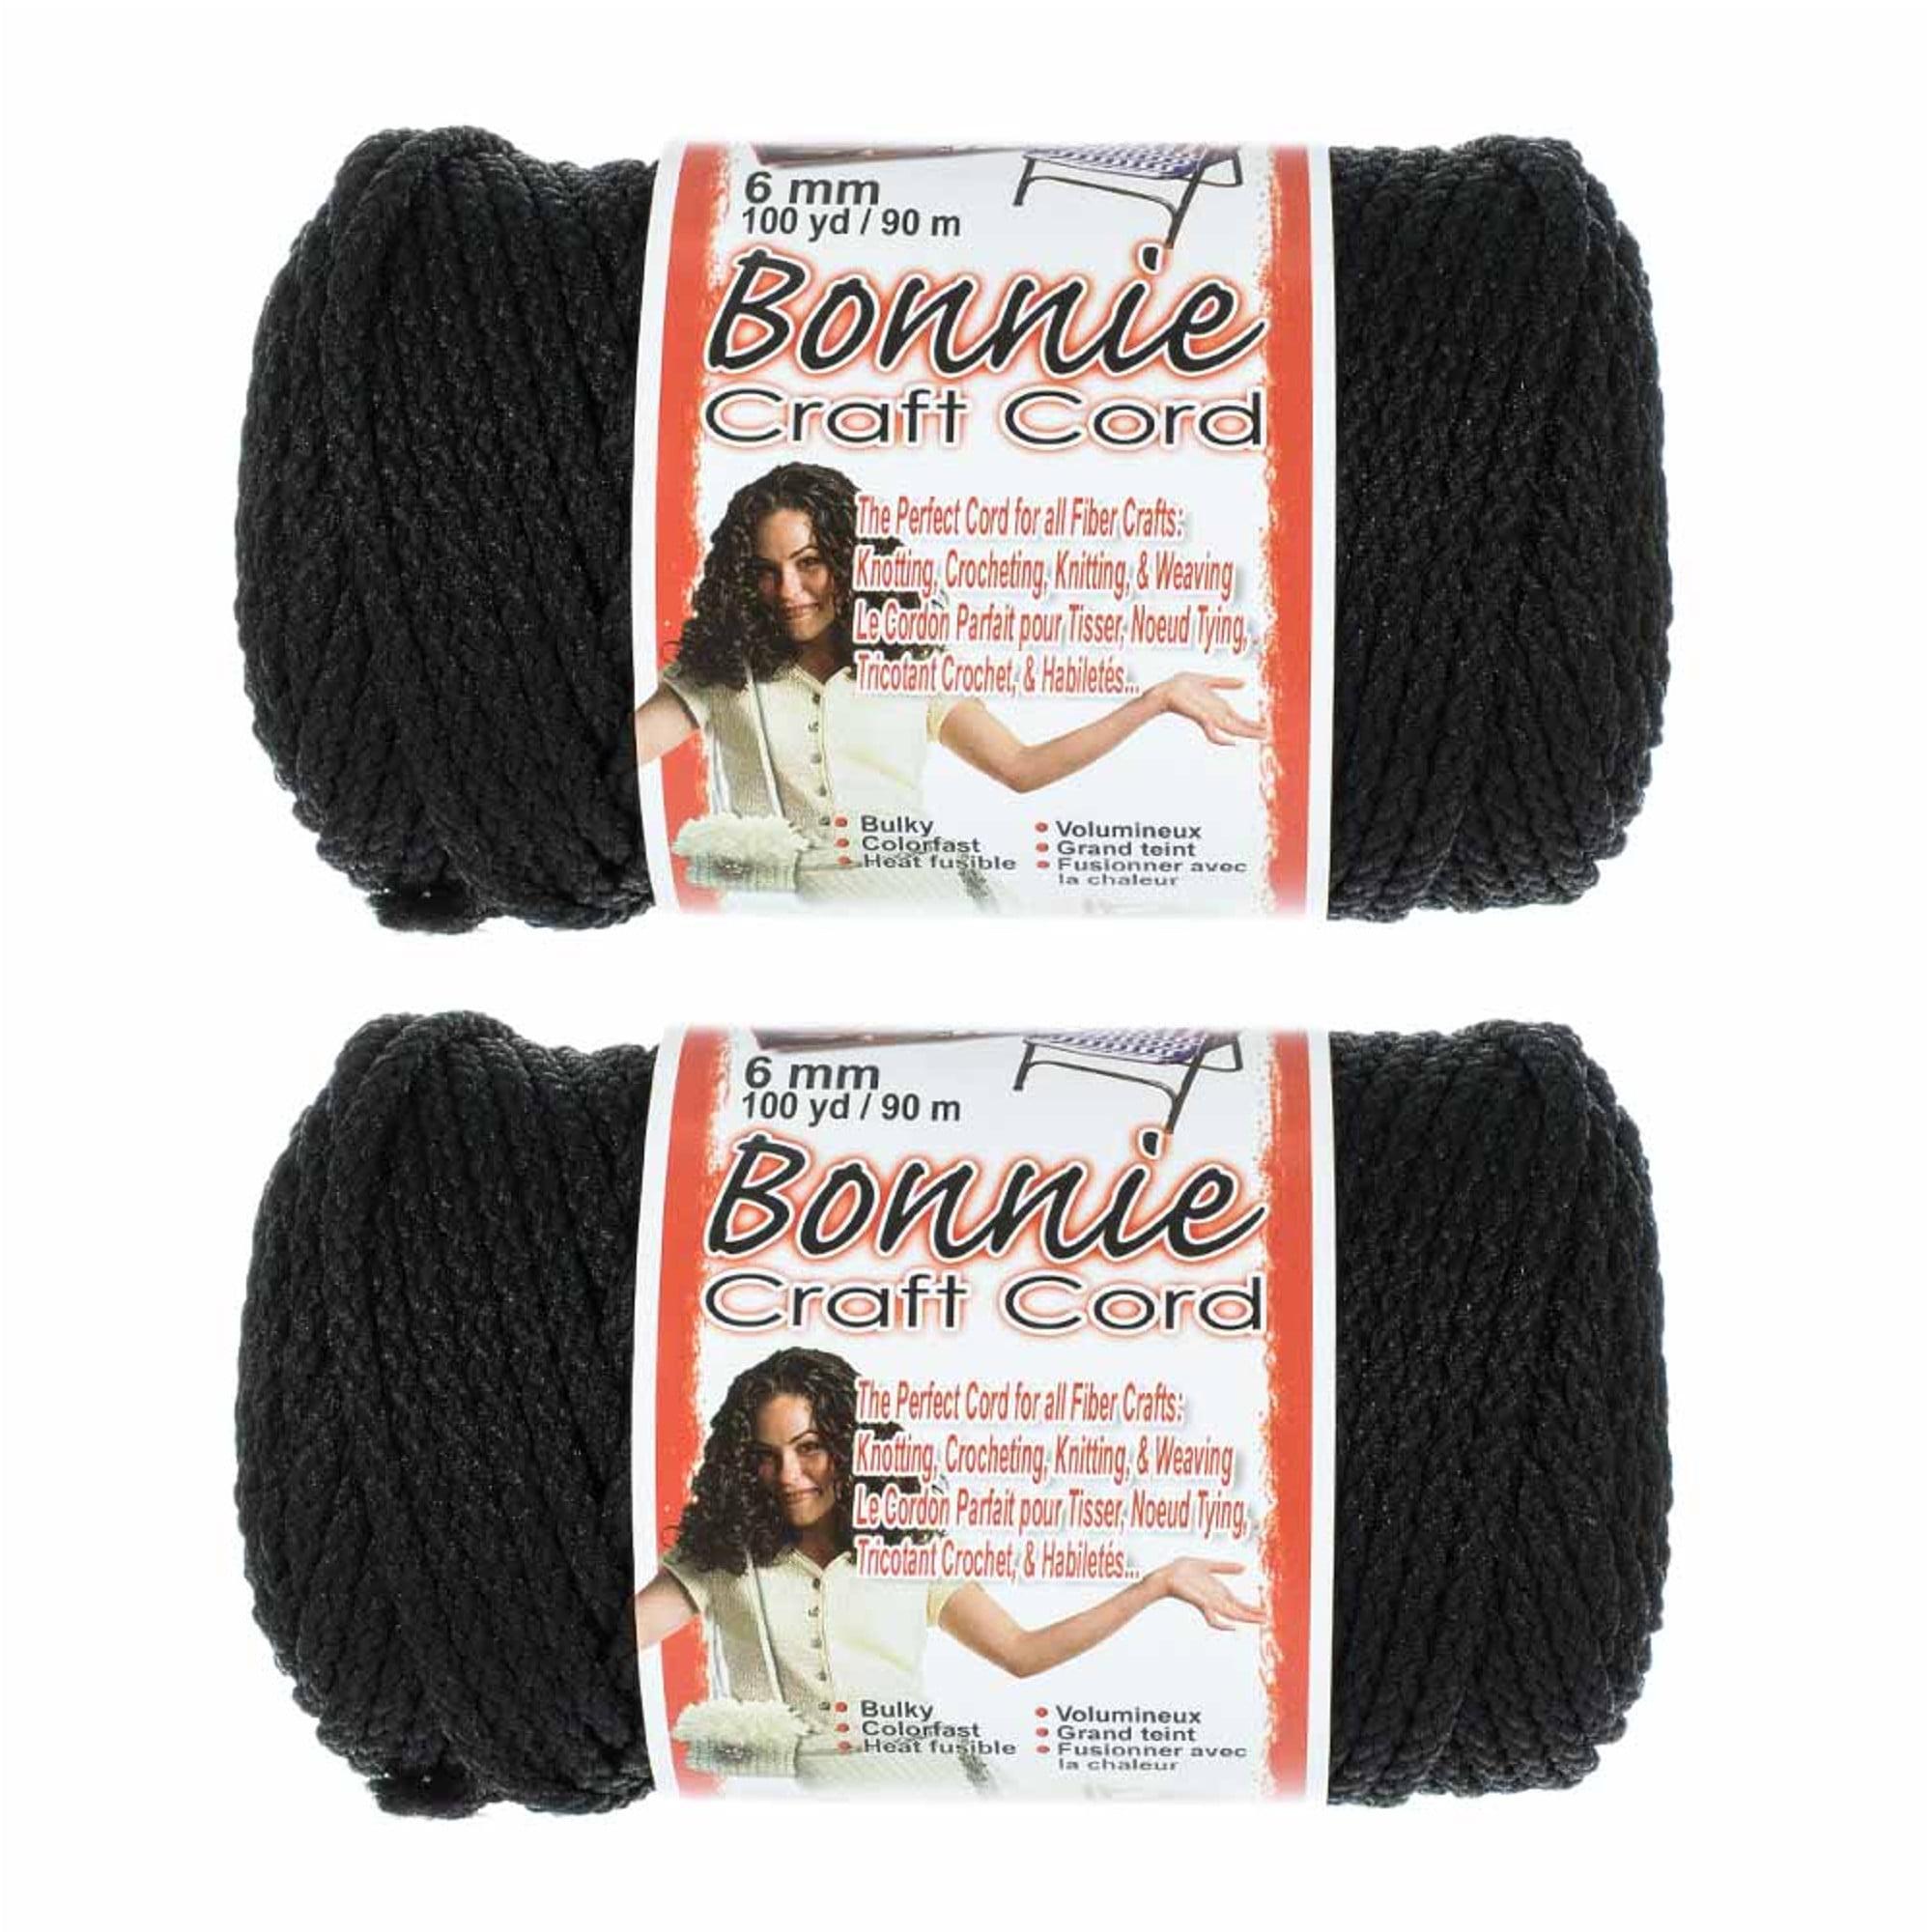 2 Pack Bonnie Macrame Cord - 6mm - 100 yd Lengths - Various Colors